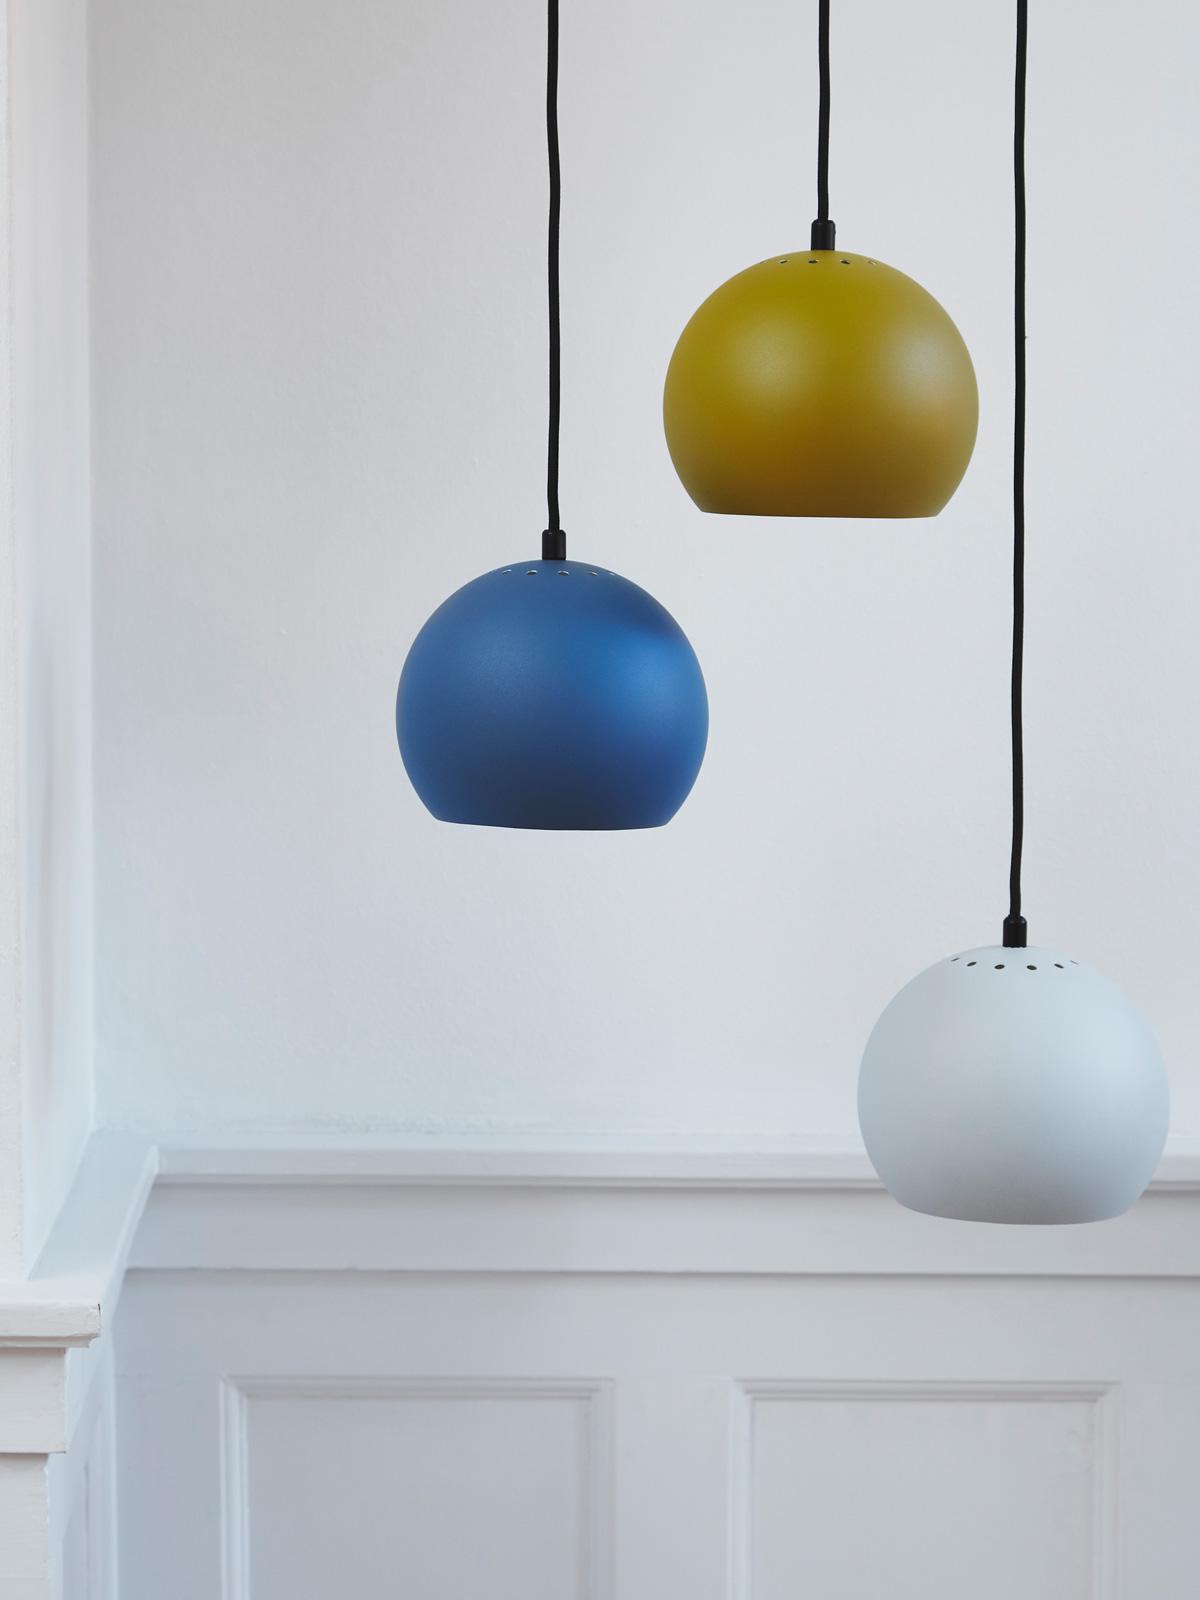 Ball Pendelleuchte Frandsen DesignOrt Lampen